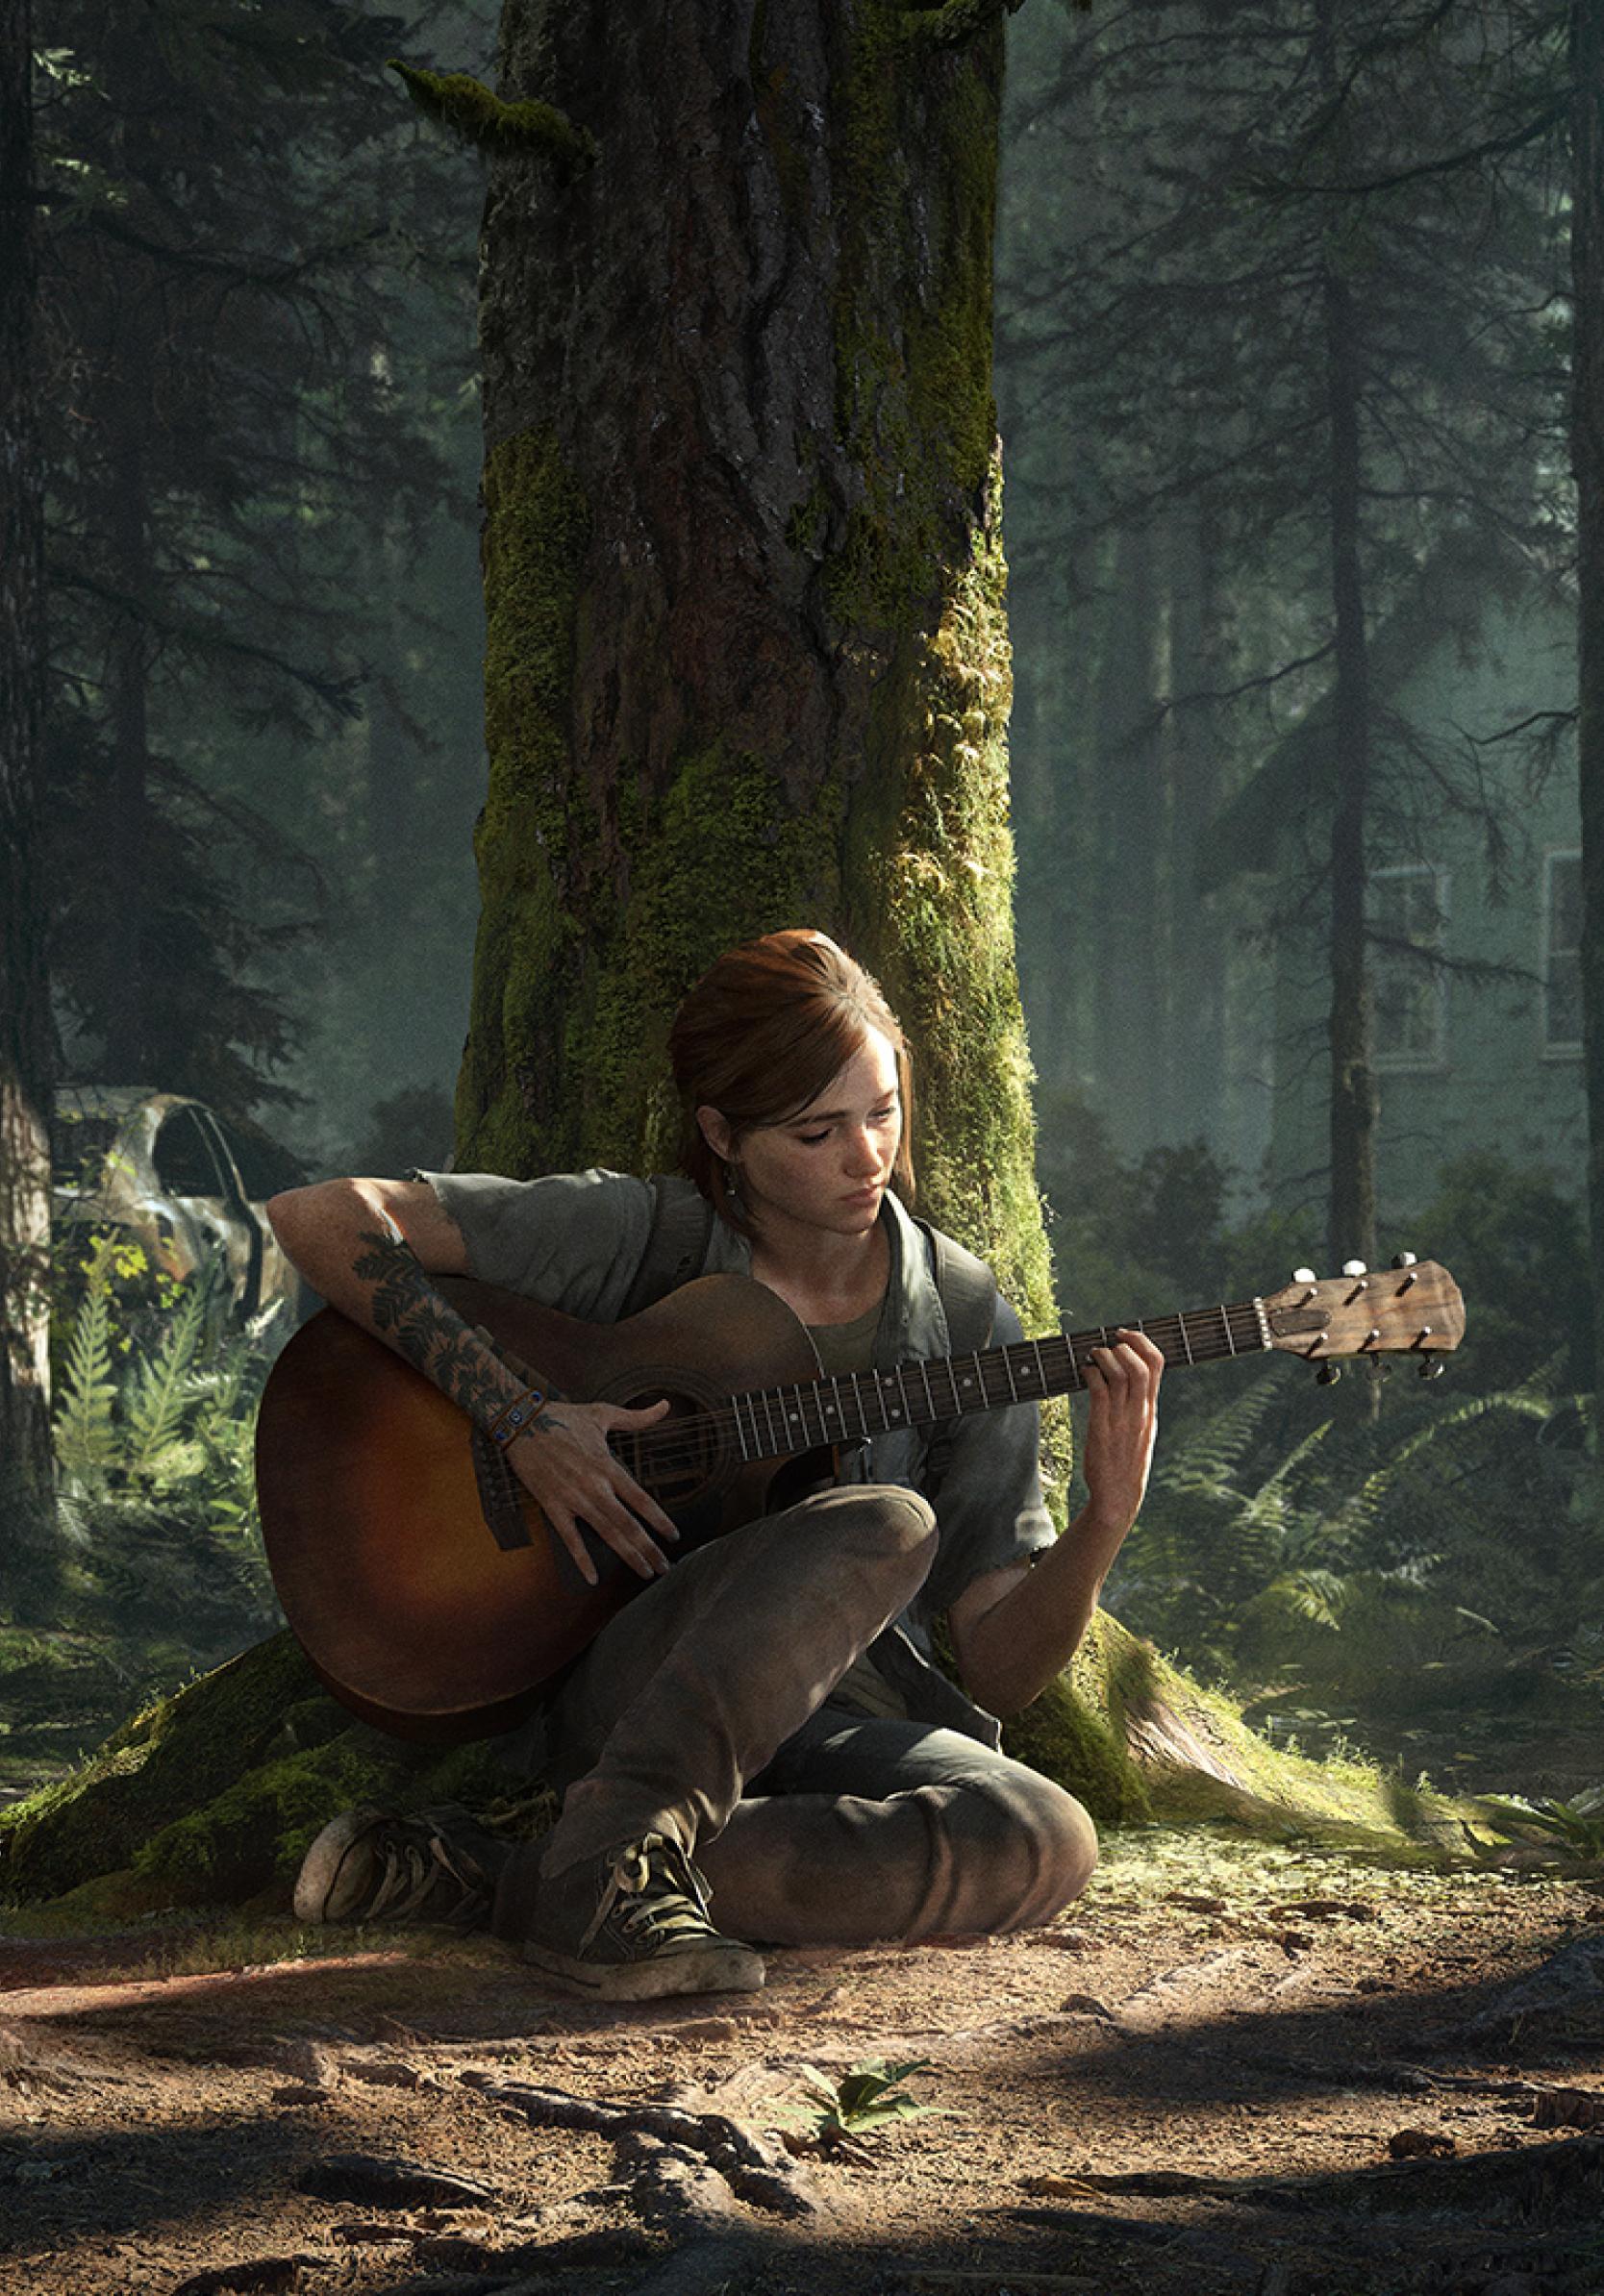 1668x2388 Ellie The Last Of Us 2 1668x2388 Resolution Wallpaper